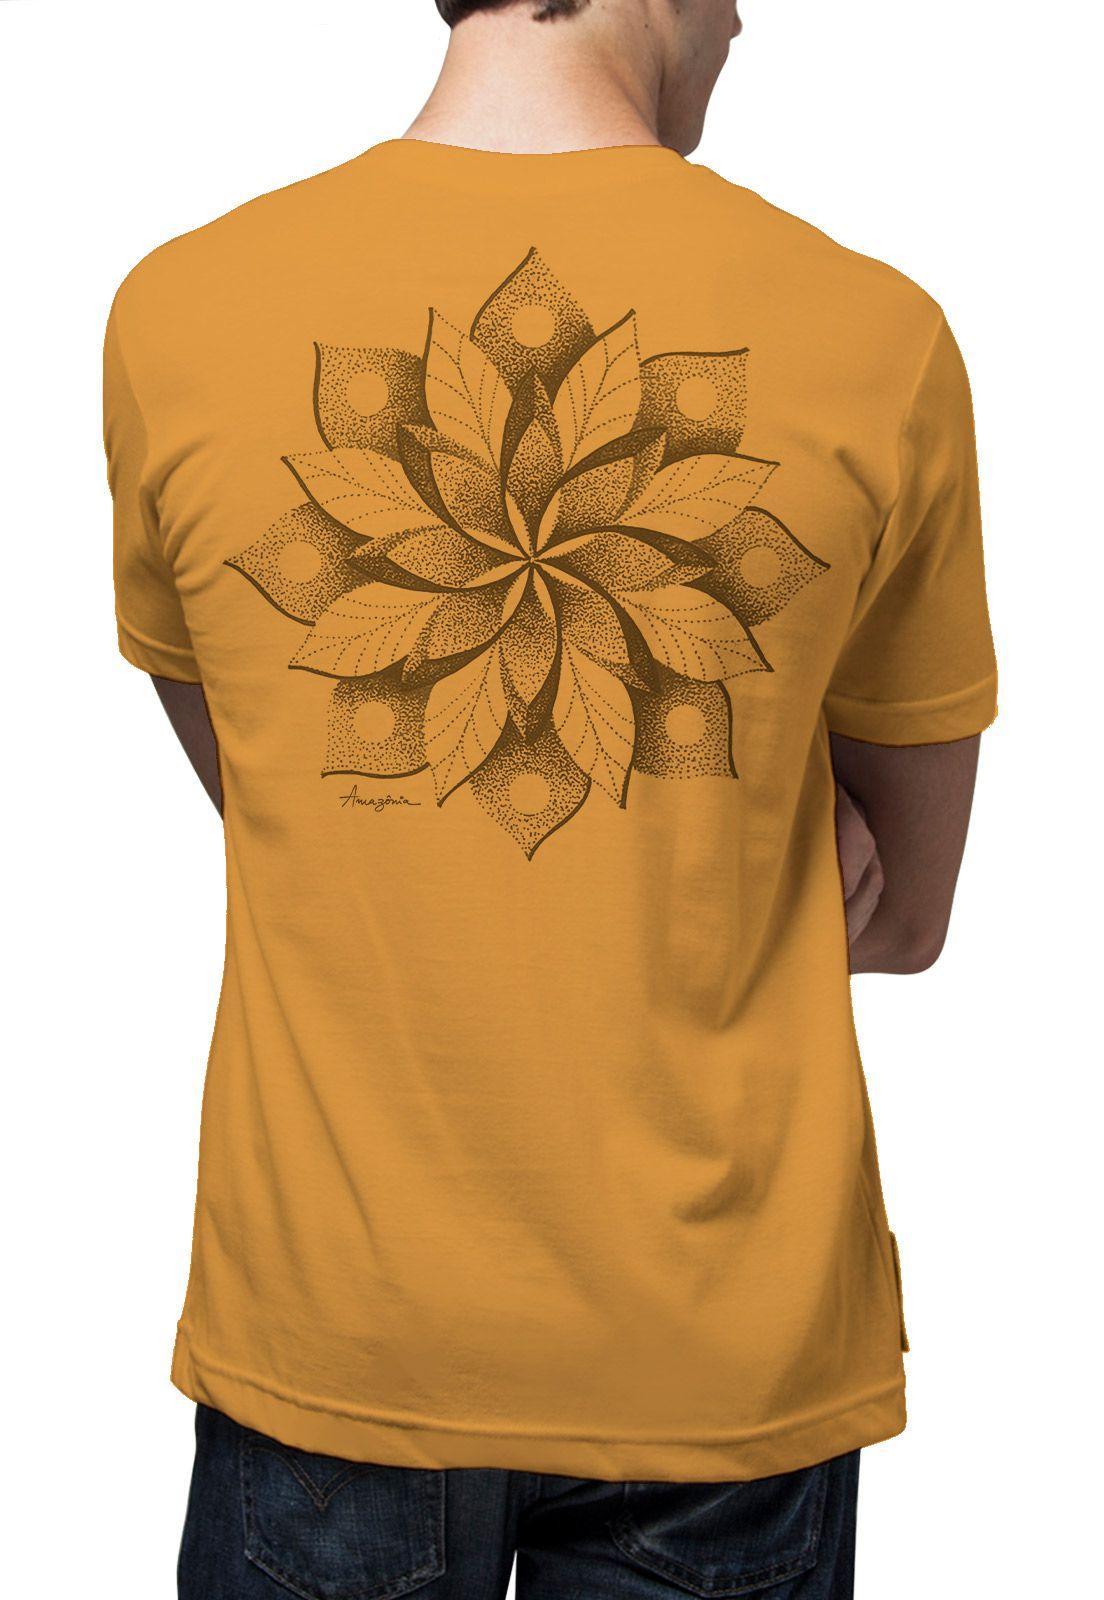 Camiseta Amazônia Mandala Flor - Amarelo Escuro